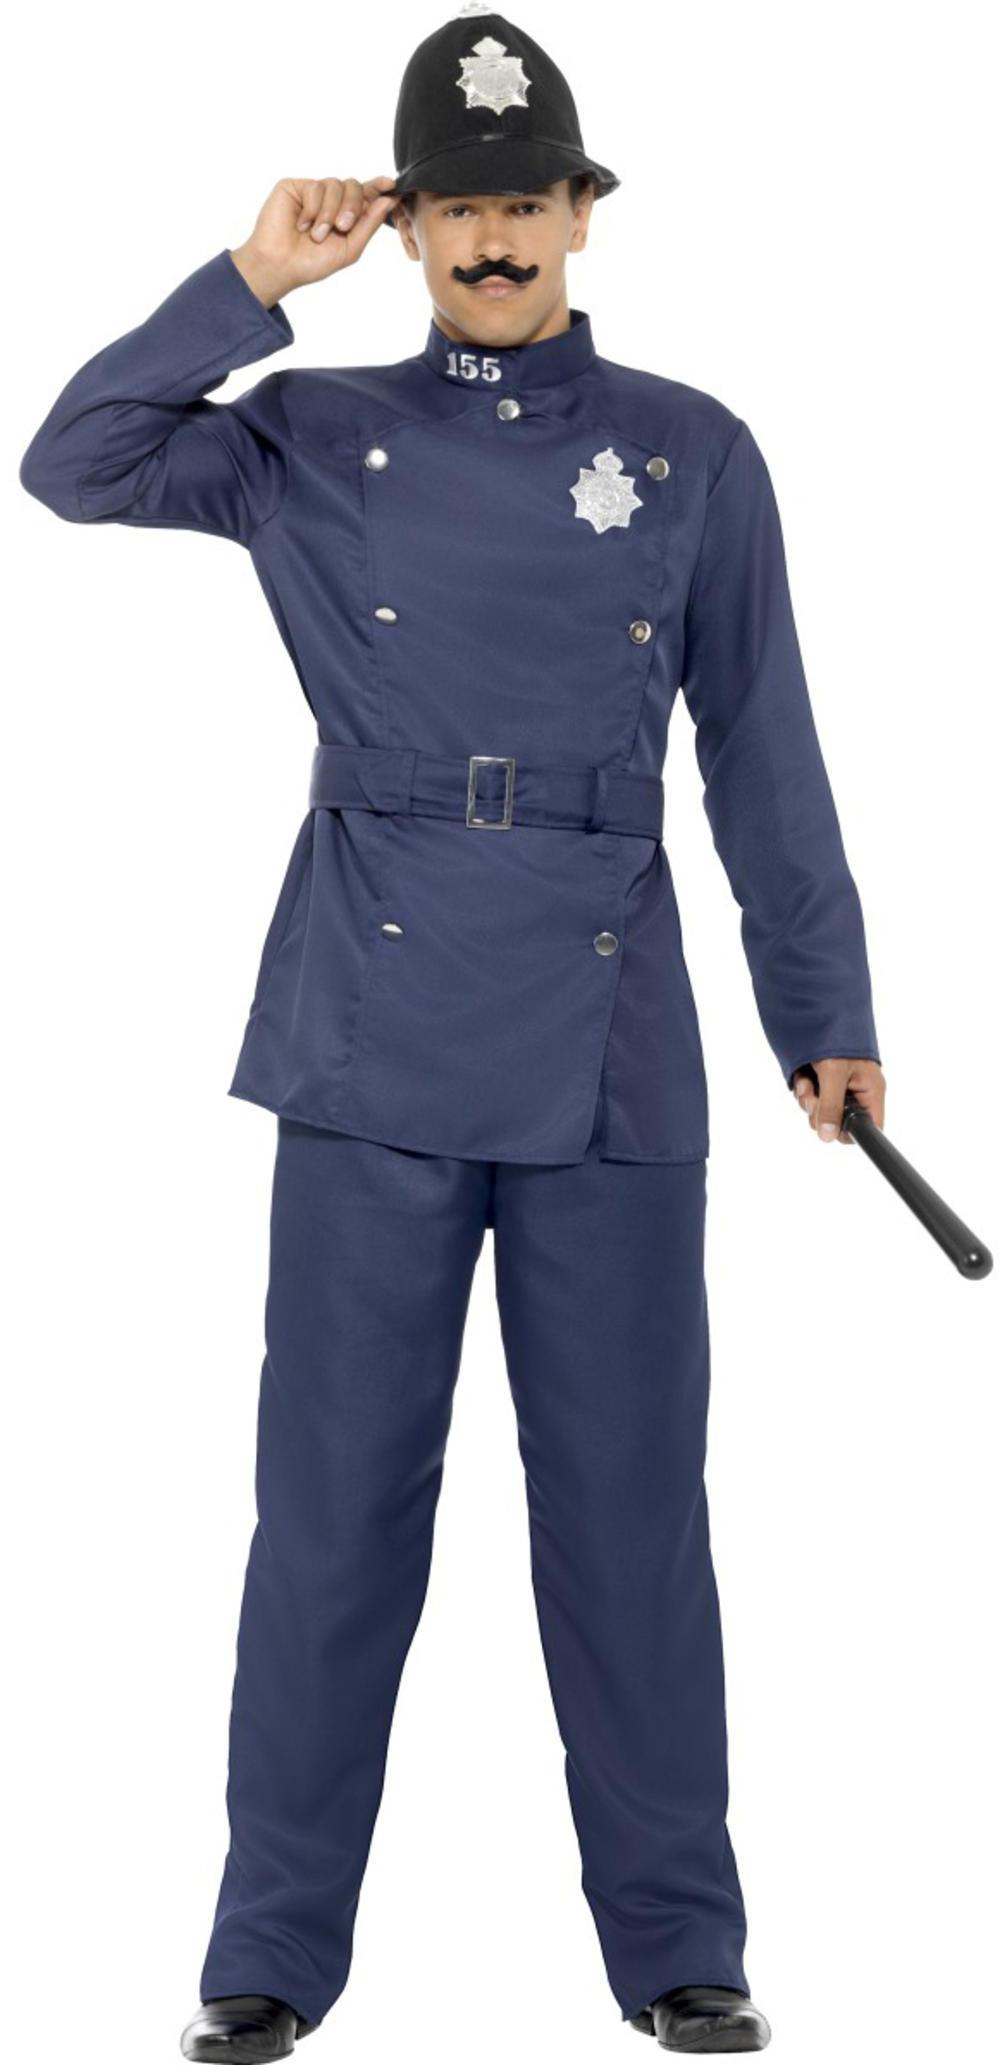 London Bobby Mens Fancy Dress Policeman Officer Uniform Occupation Adult Costume